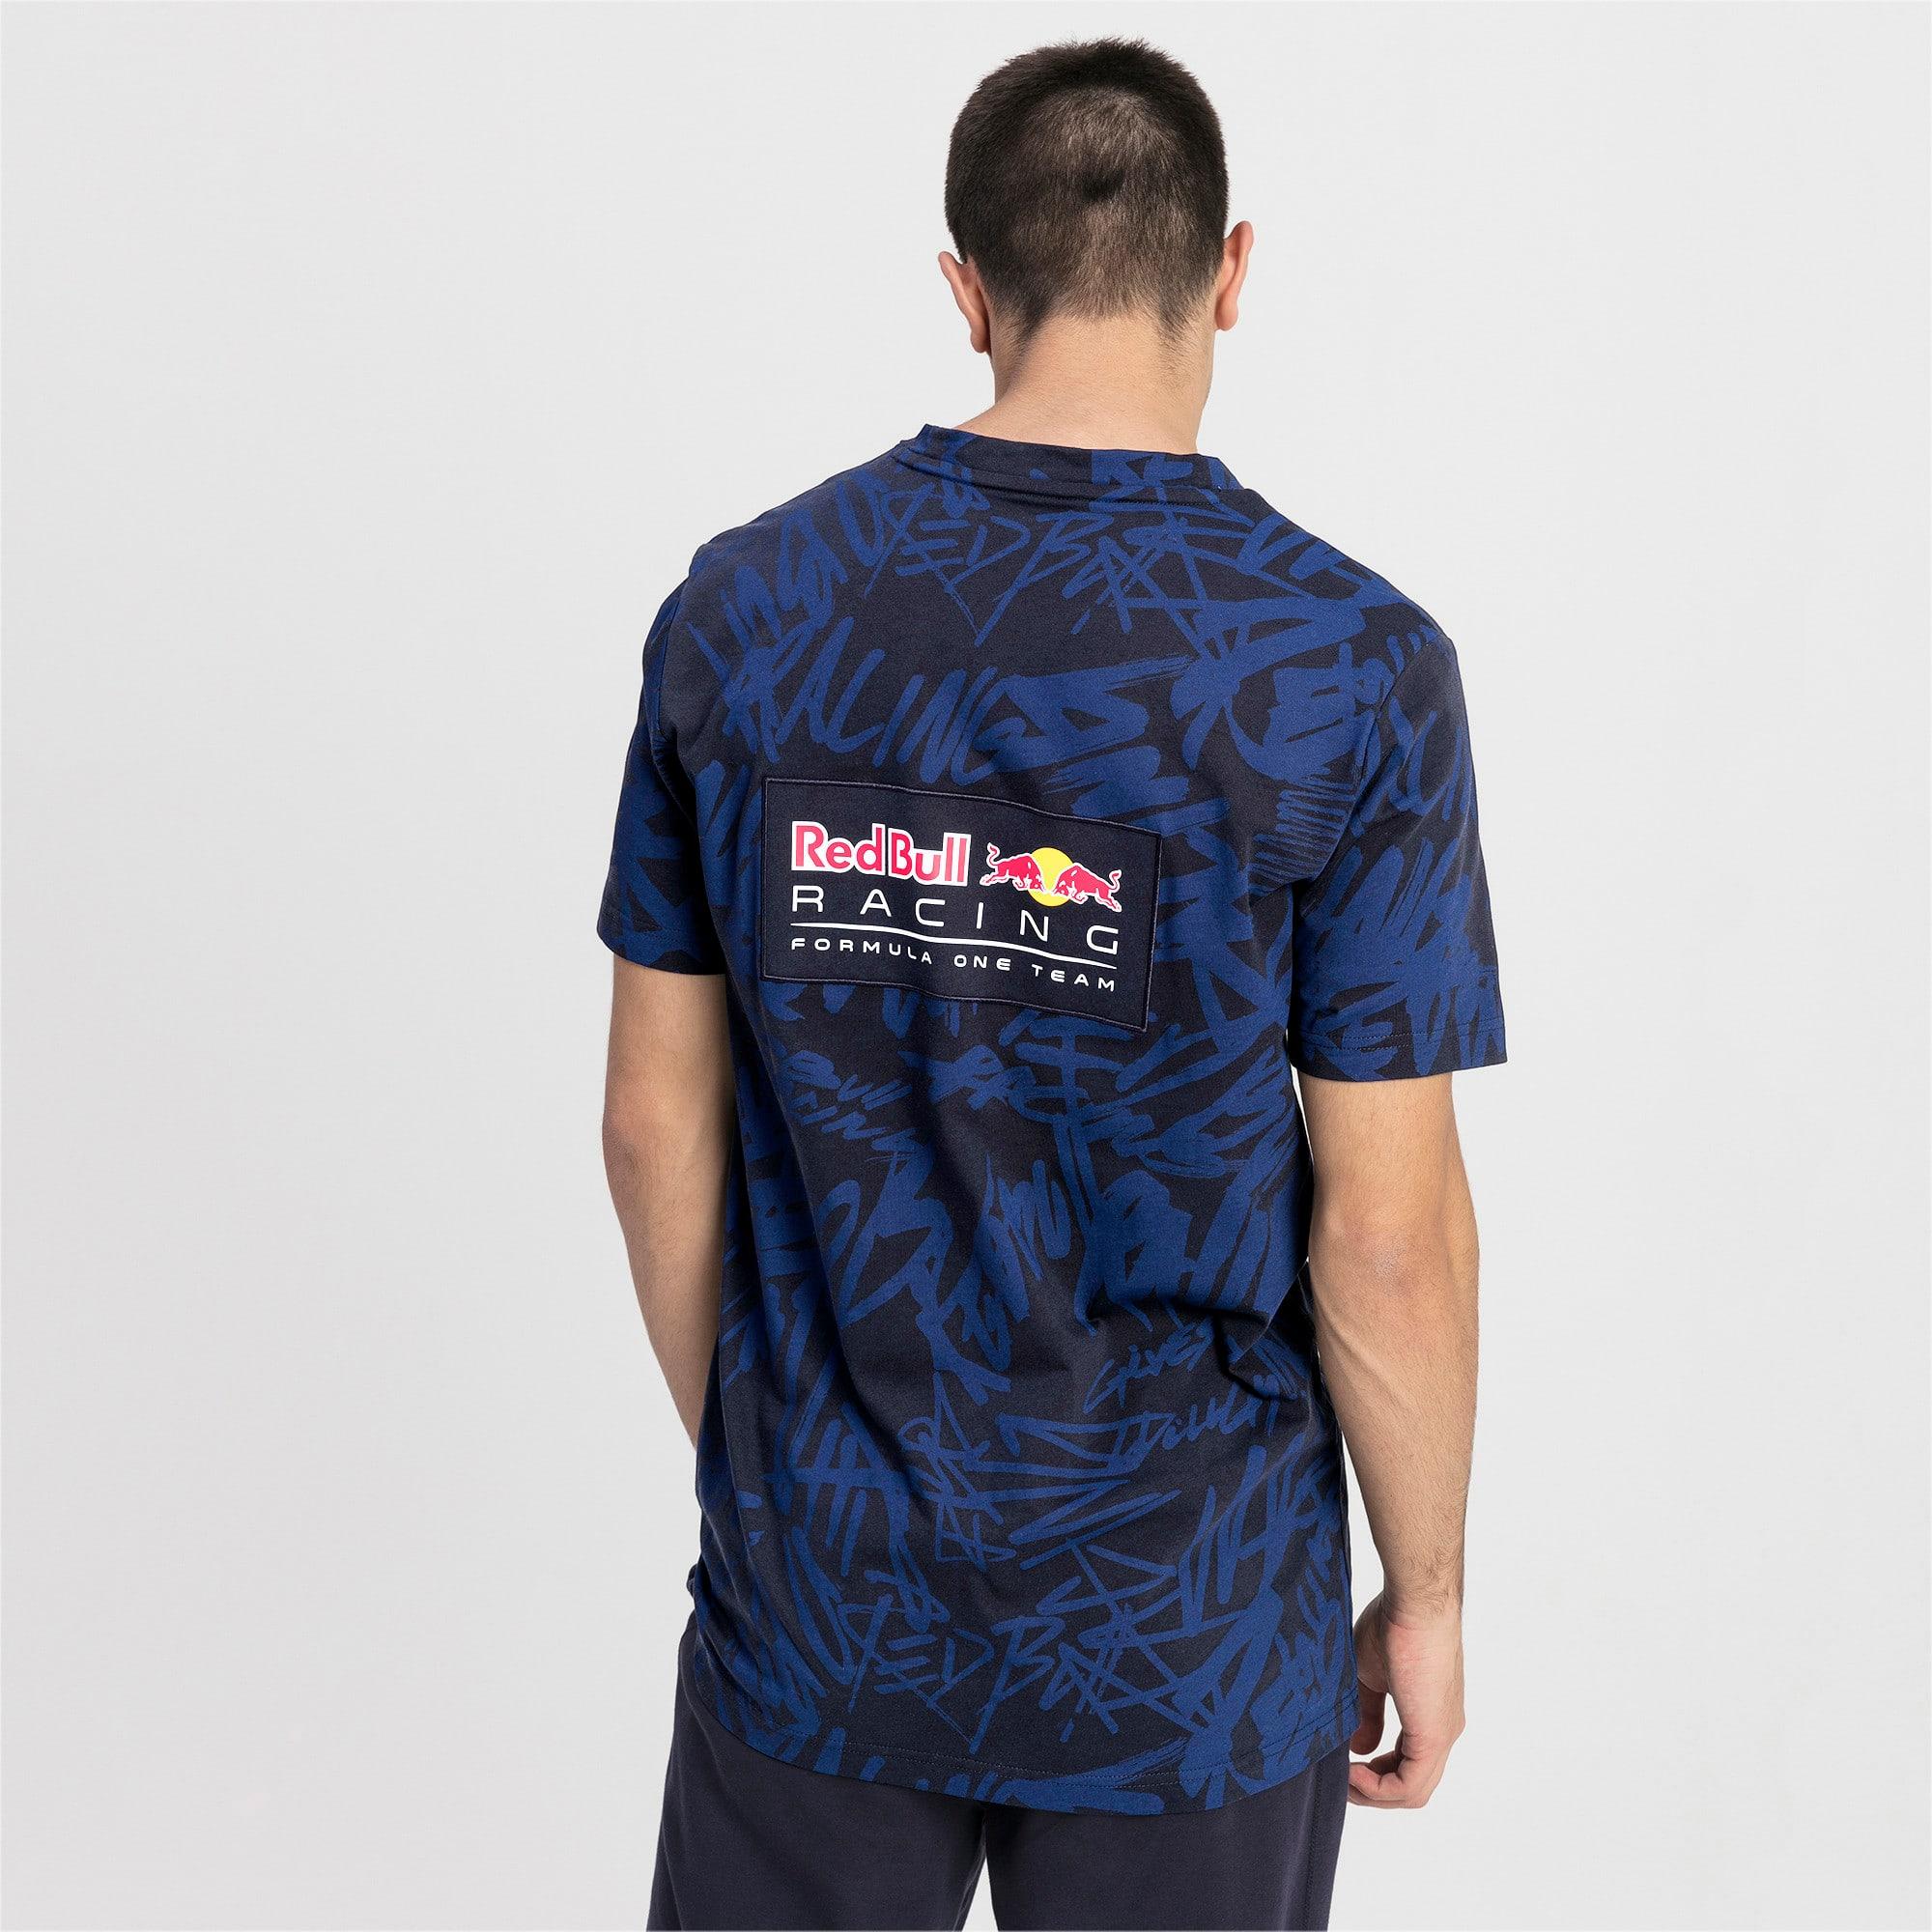 Thumbnail 2 of Red Bull Racing Herren T-Shirt, NIGHT SKY, medium